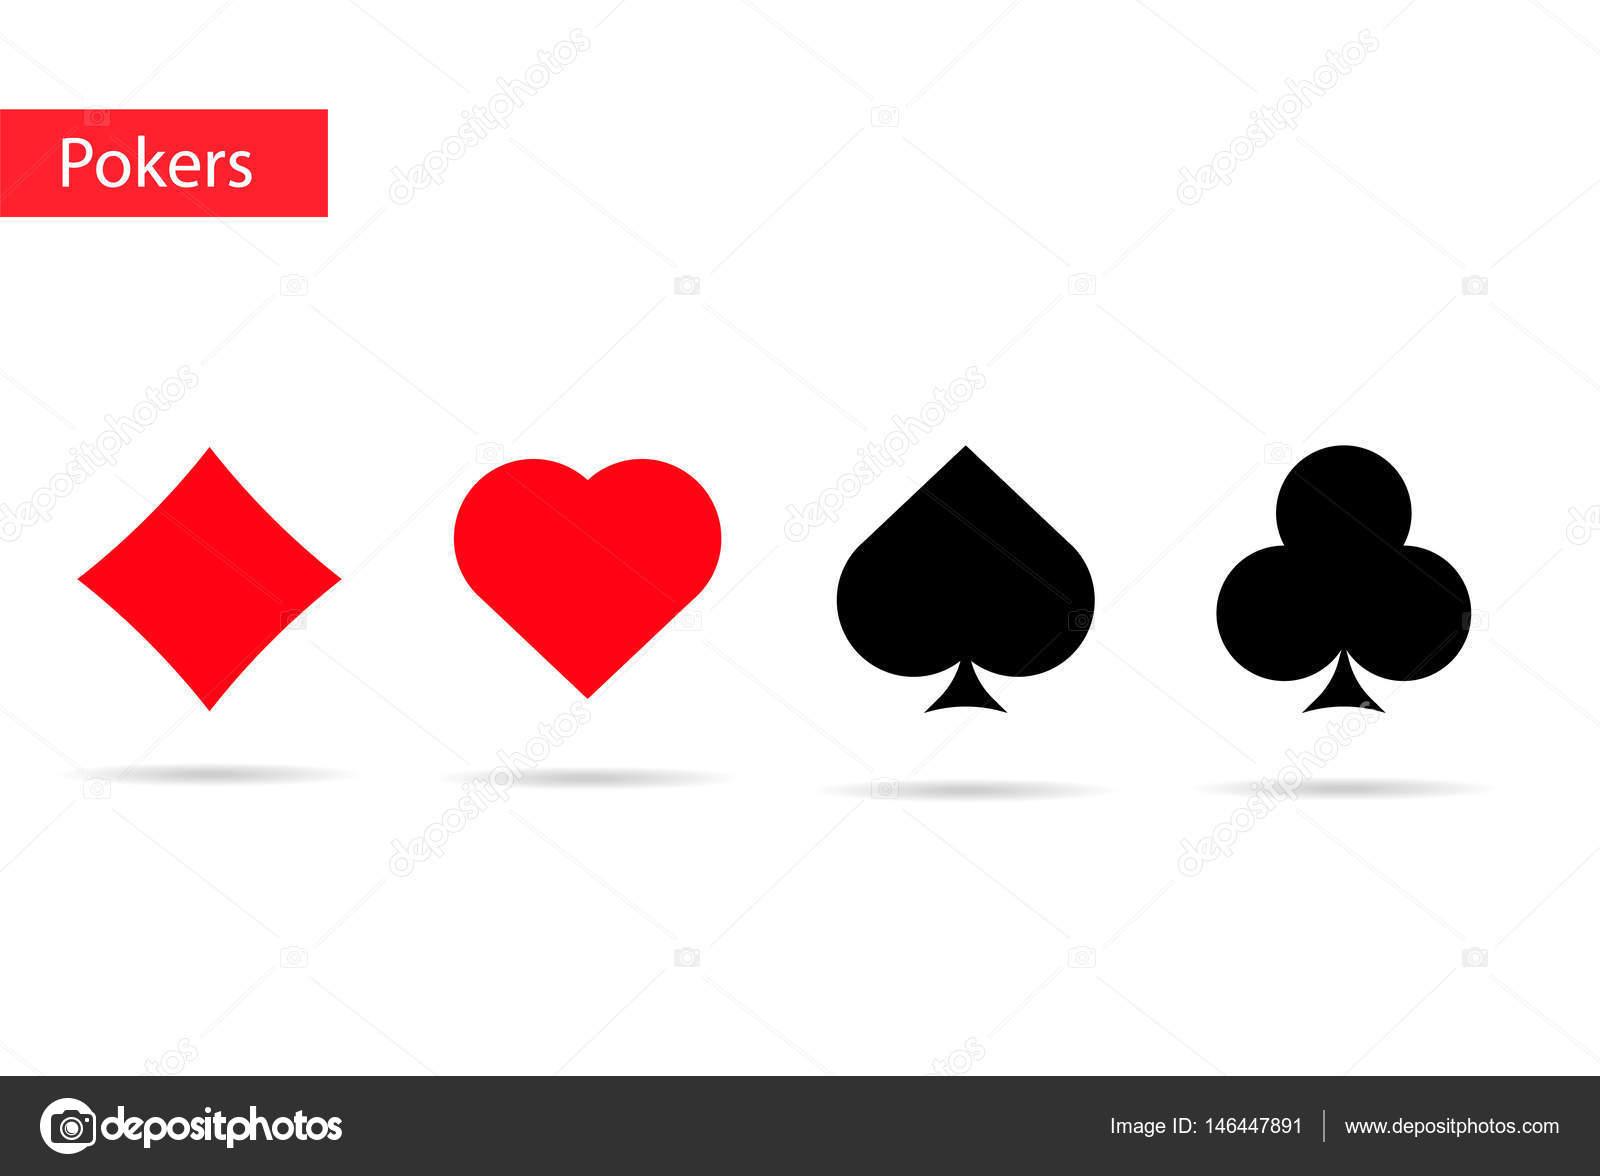 Playing Cards Symbols Pokers Stock Vector Dezidezi 146447891